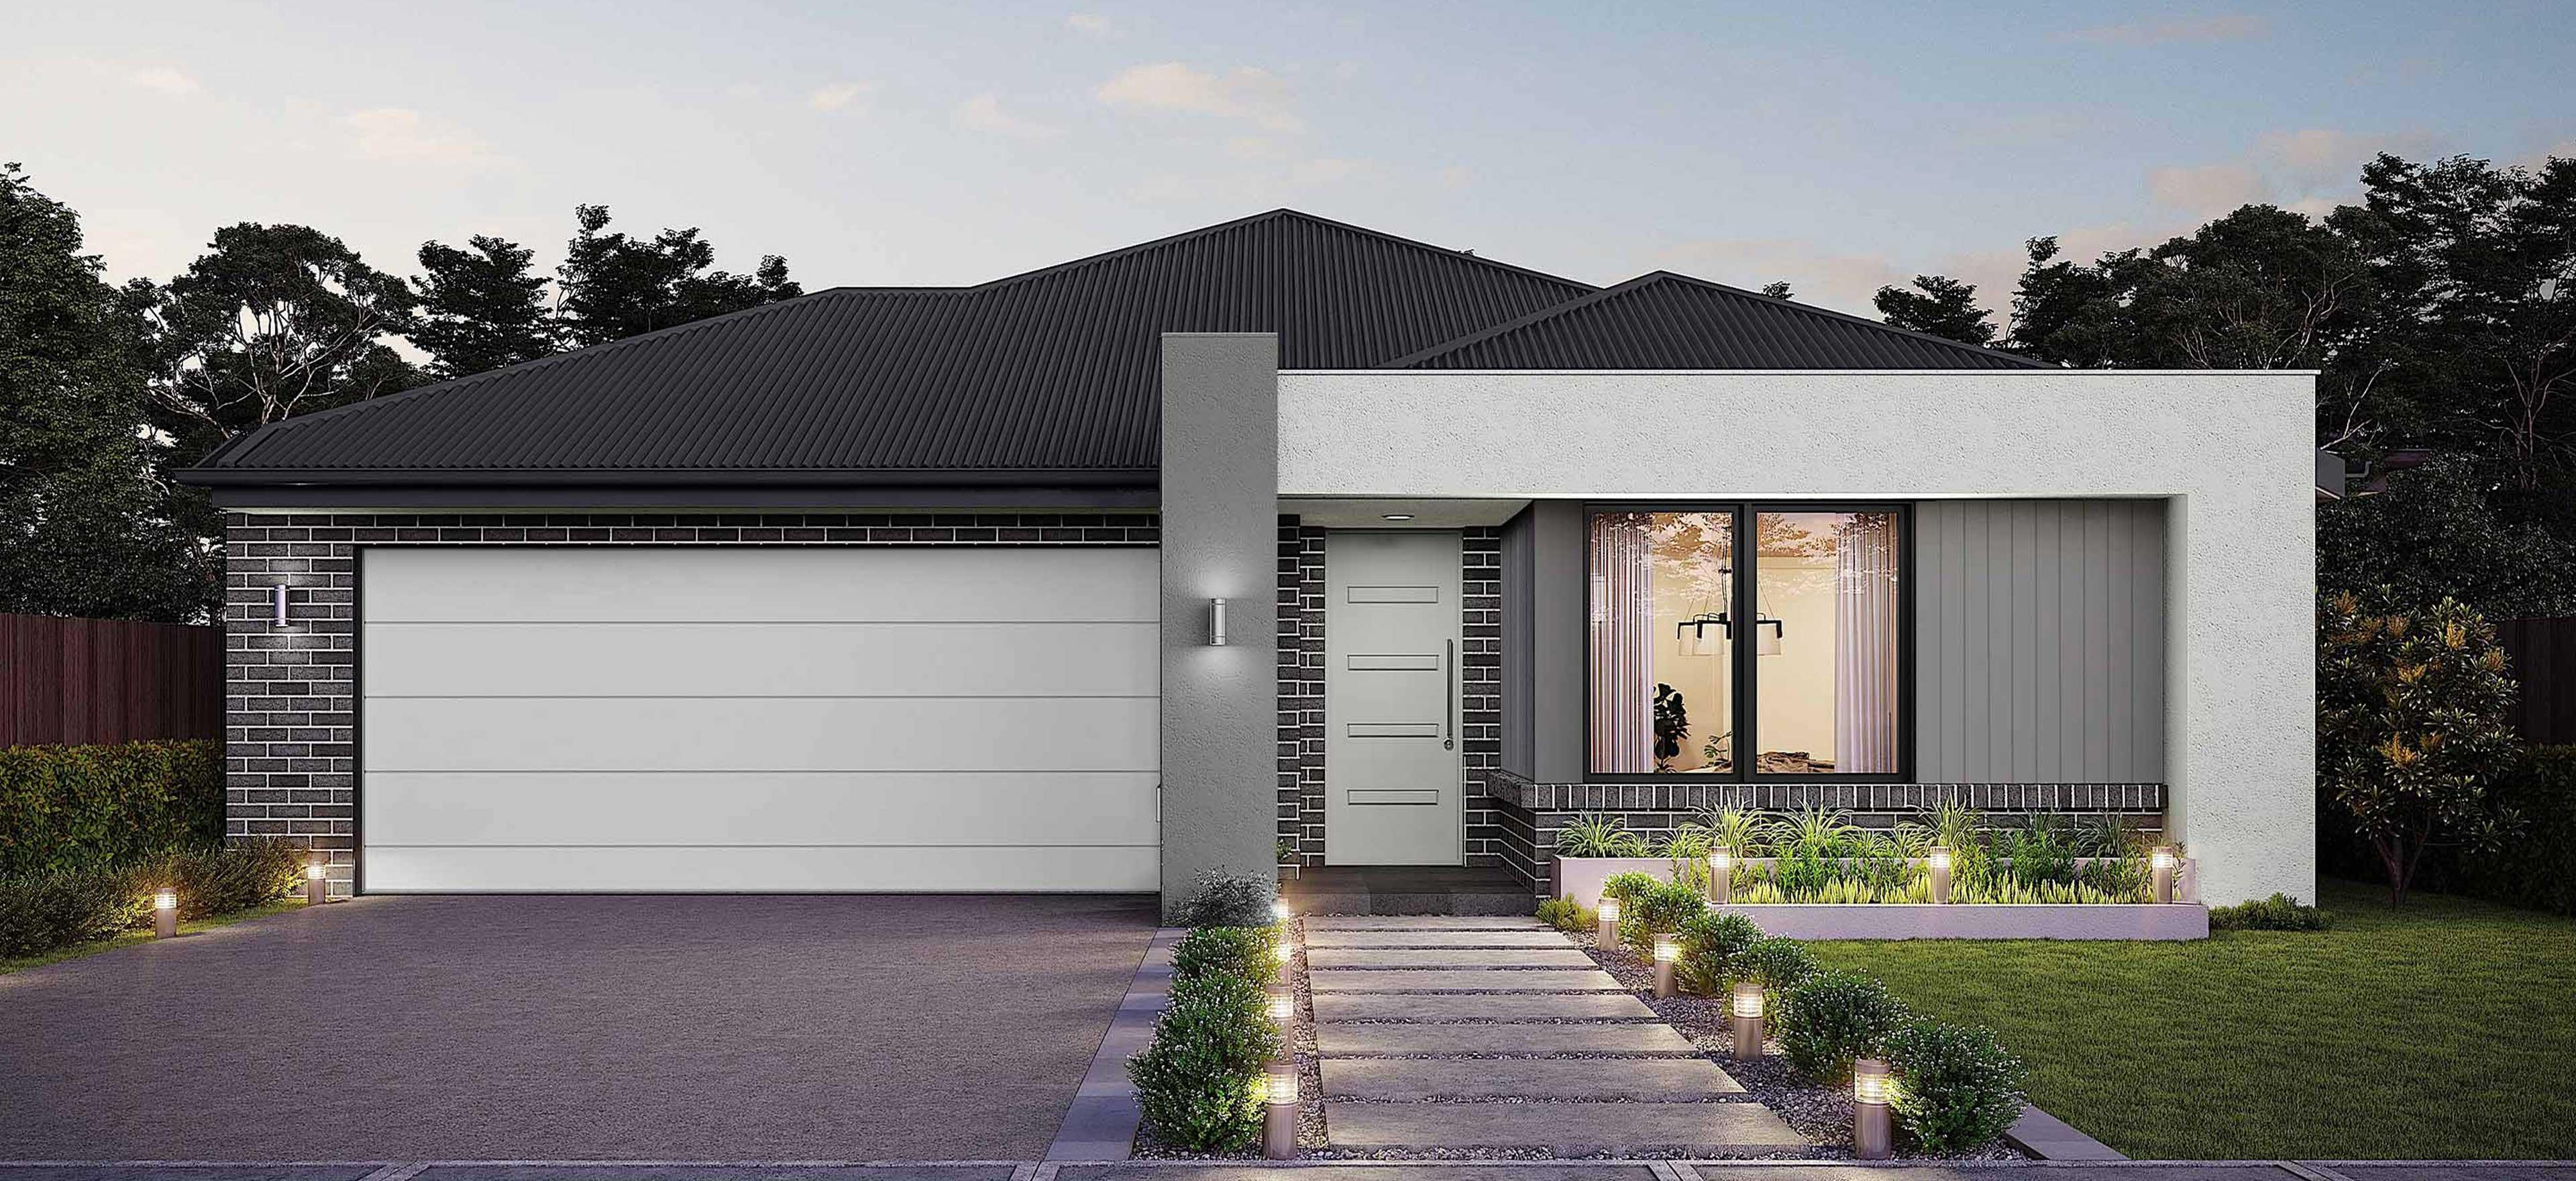 weeks-new-build-homes-adelaide-south-australia